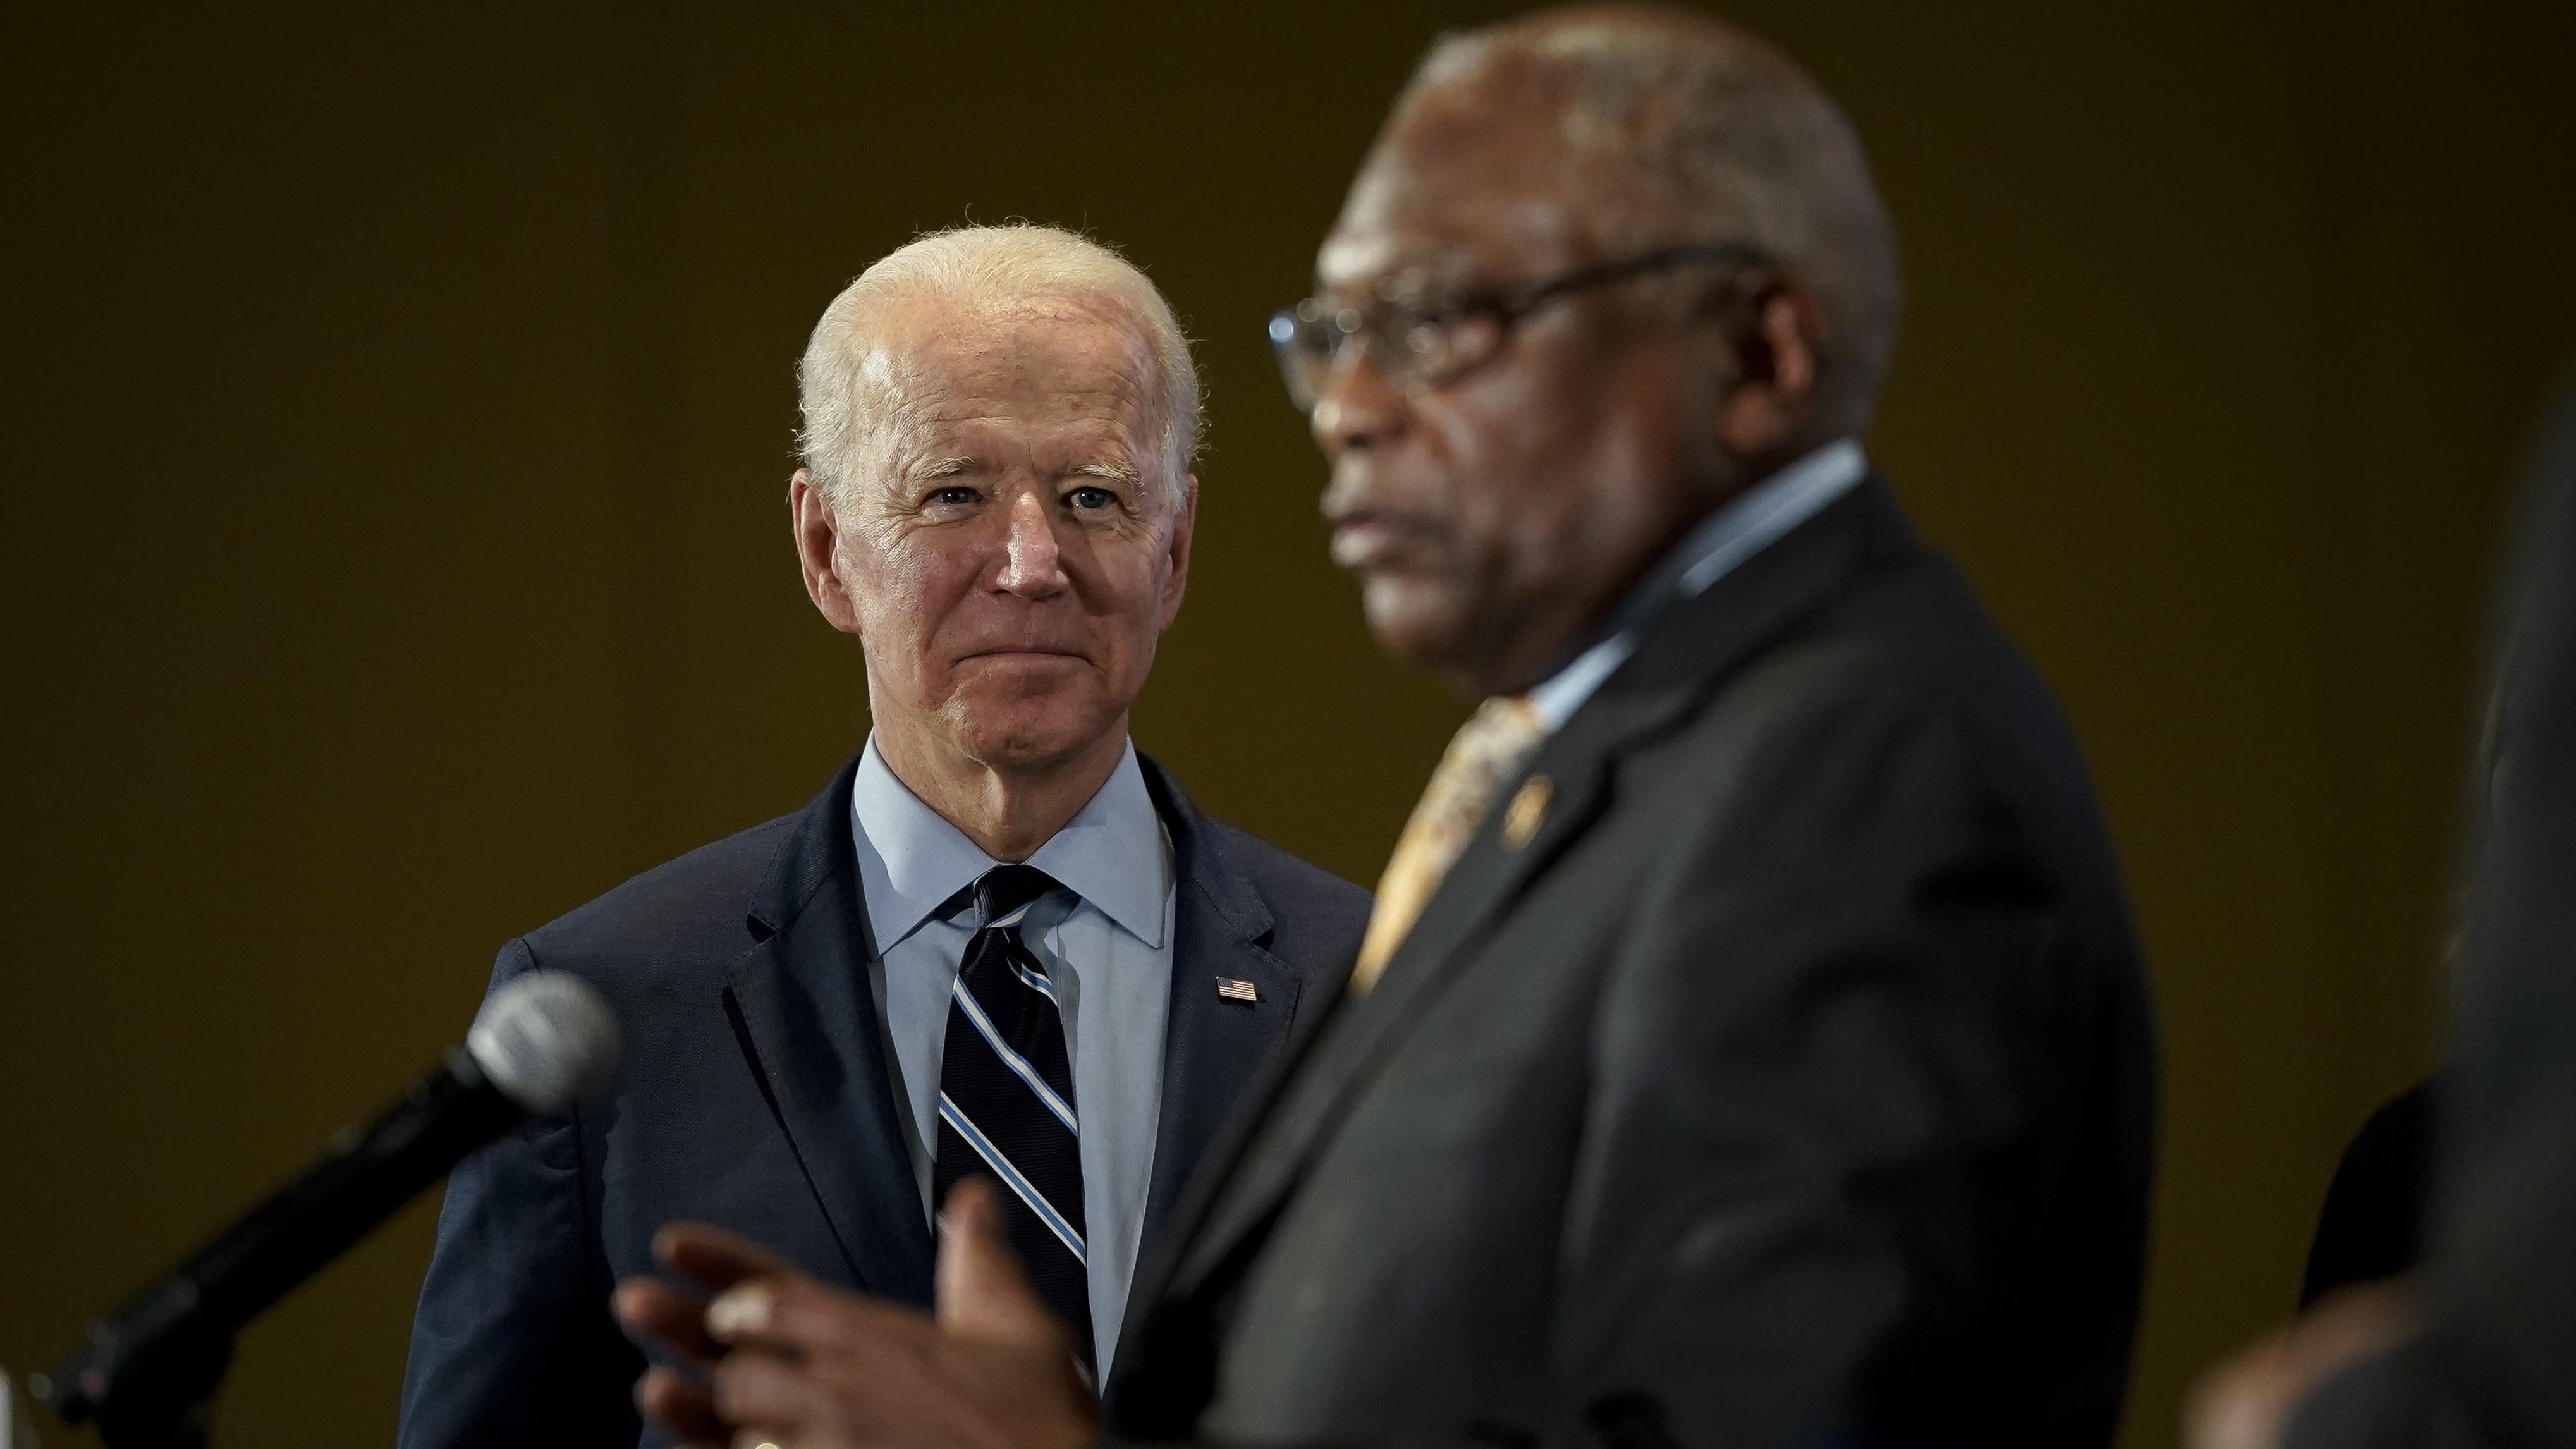 Joe Biden Gets Boost With Endorsement Of Influential South Carolina Democrat